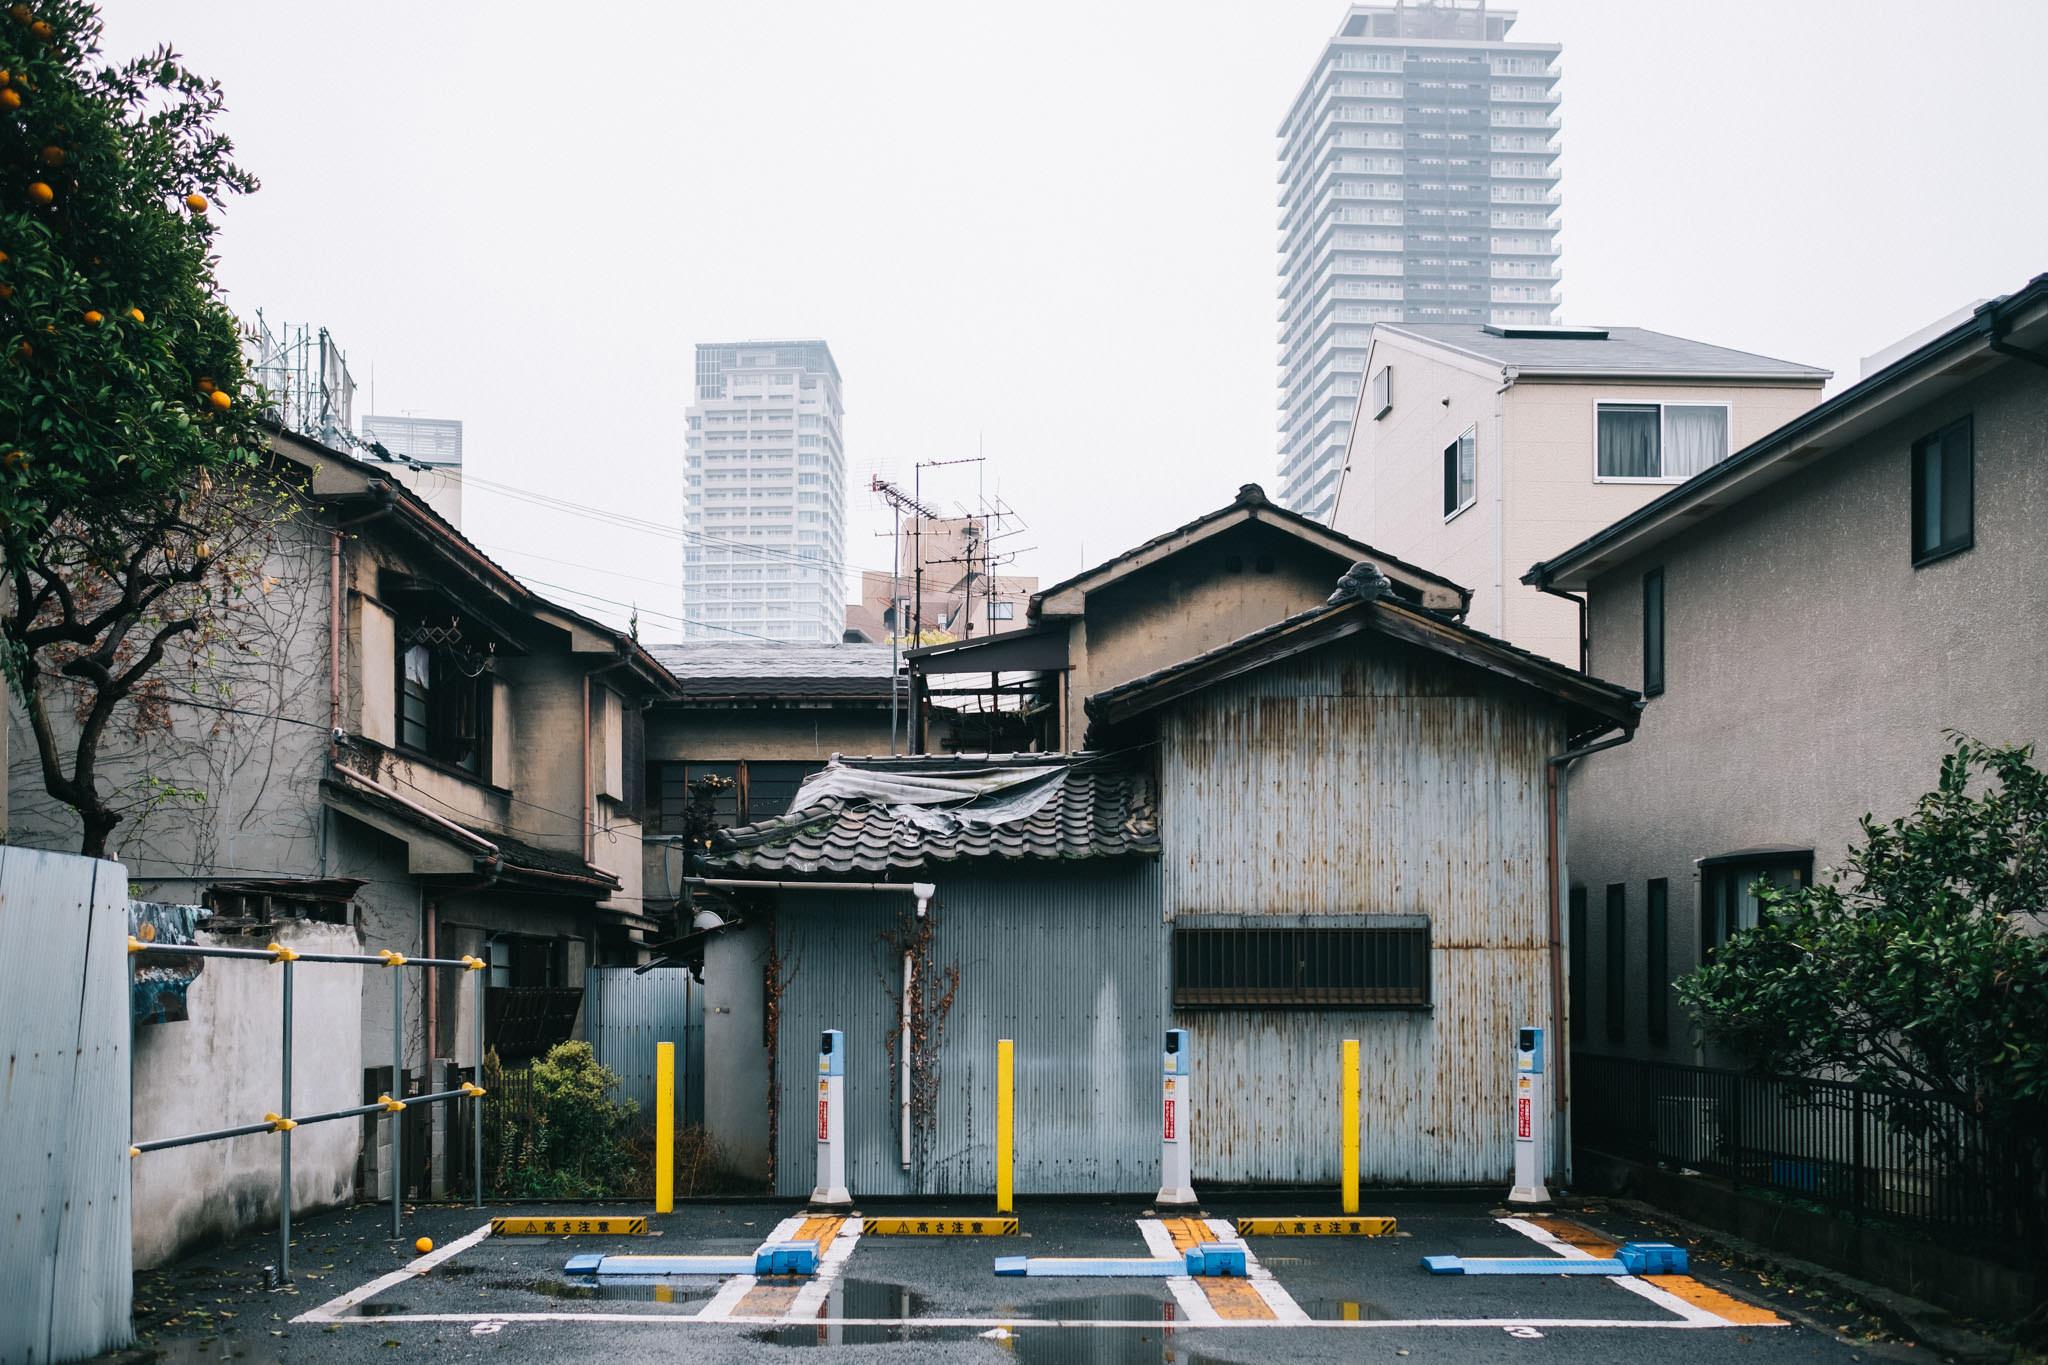 chris_eberhardt_japan_travel_reise_nippon-40.jpg